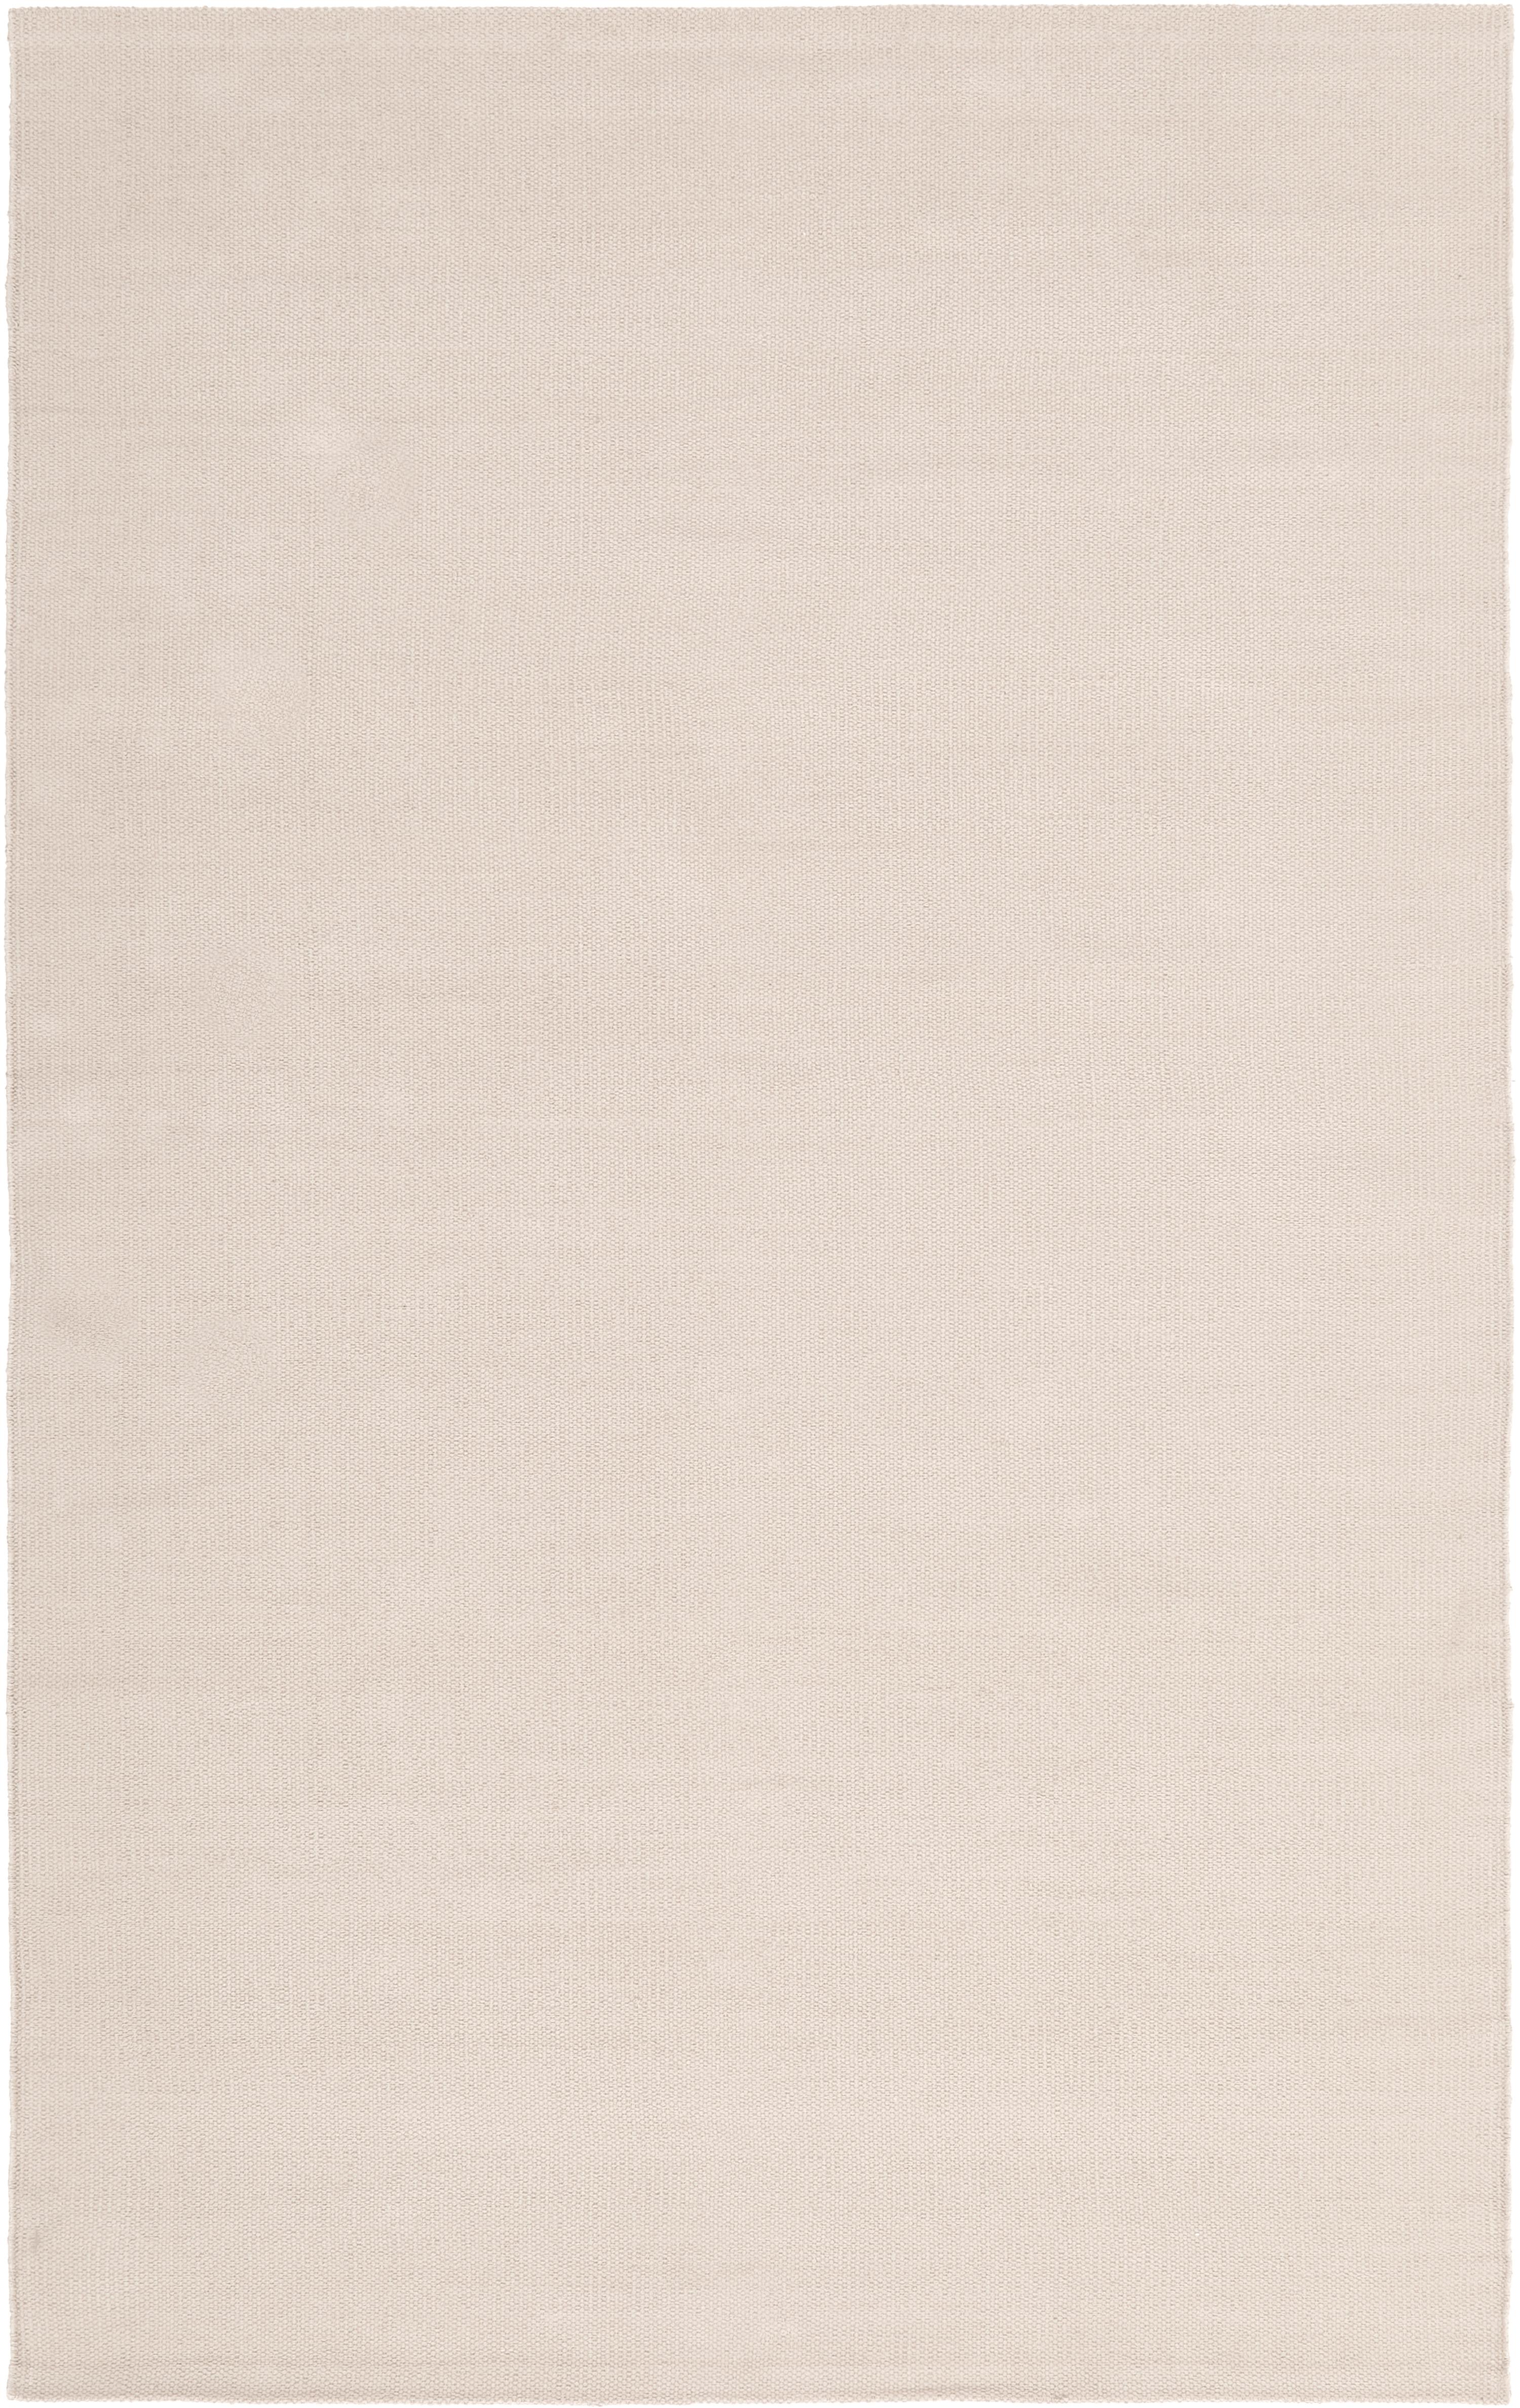 Dun handgeweven katoenen vloerkleed Agneta, Katoen, Beige, B 50 x L 80 cm (maat XXS)